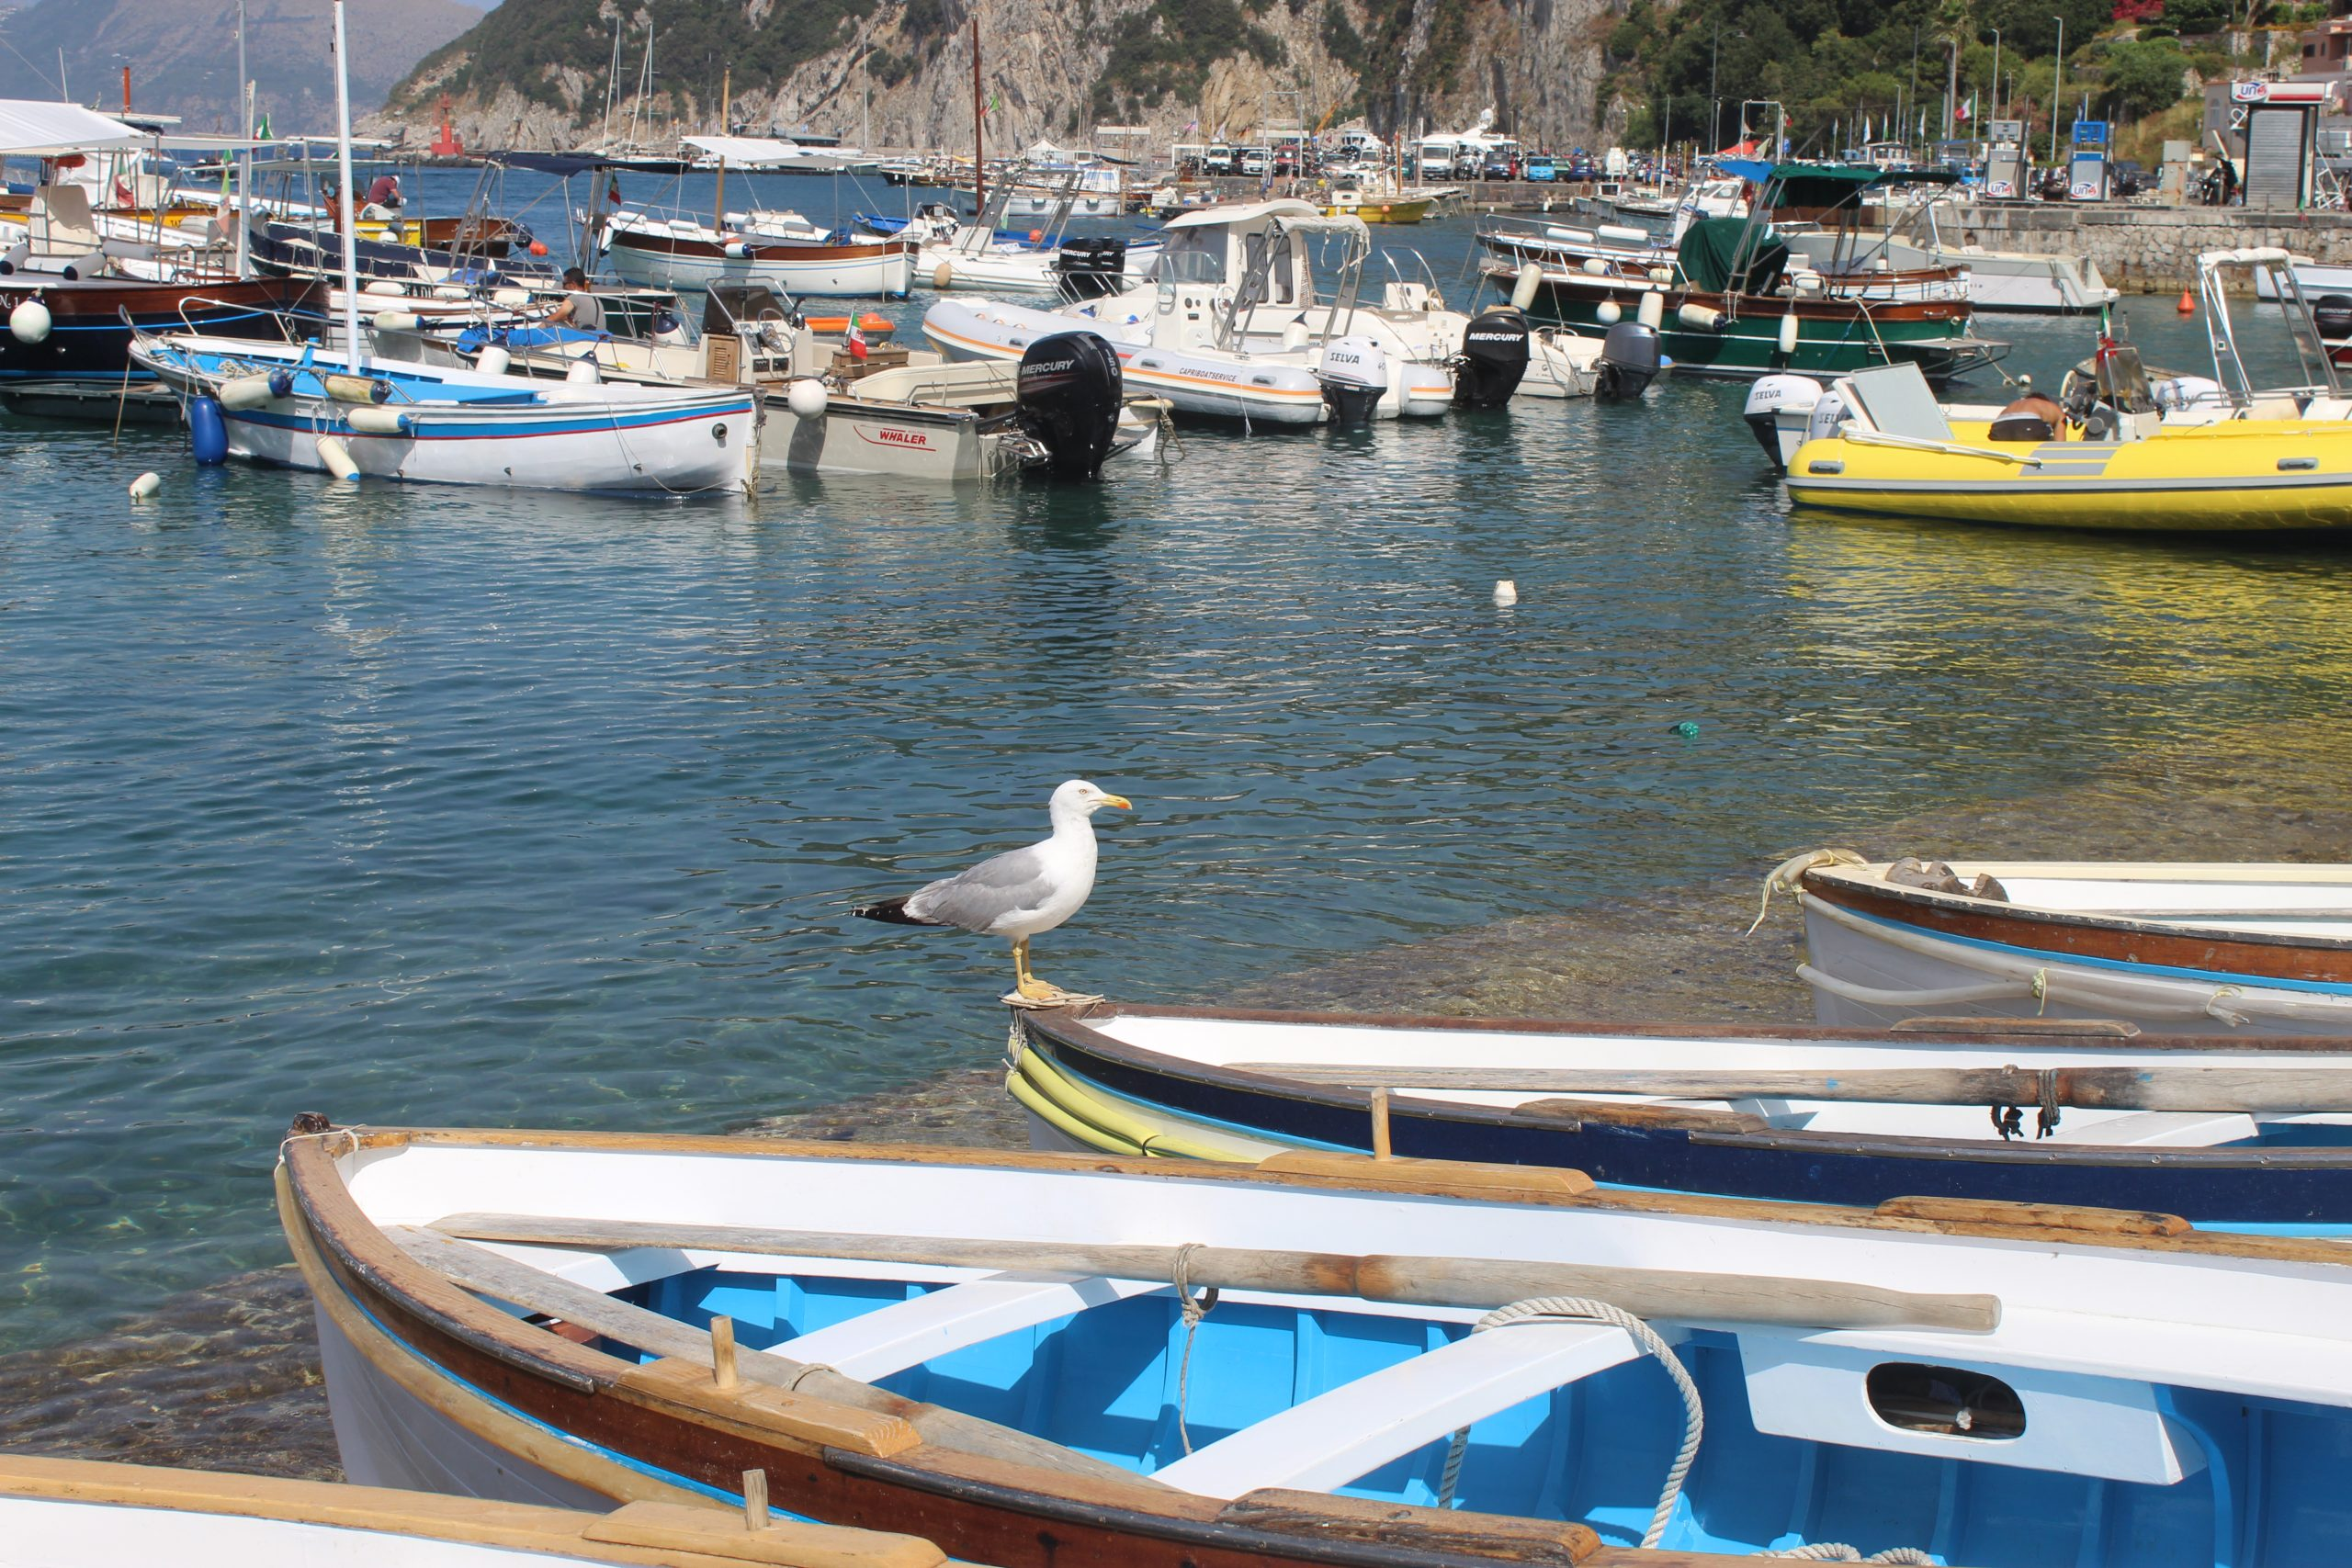 Italian Summer Vacation Capri Island Louis Vuitton Bottega Veneta Lookbook Paola Lauretano